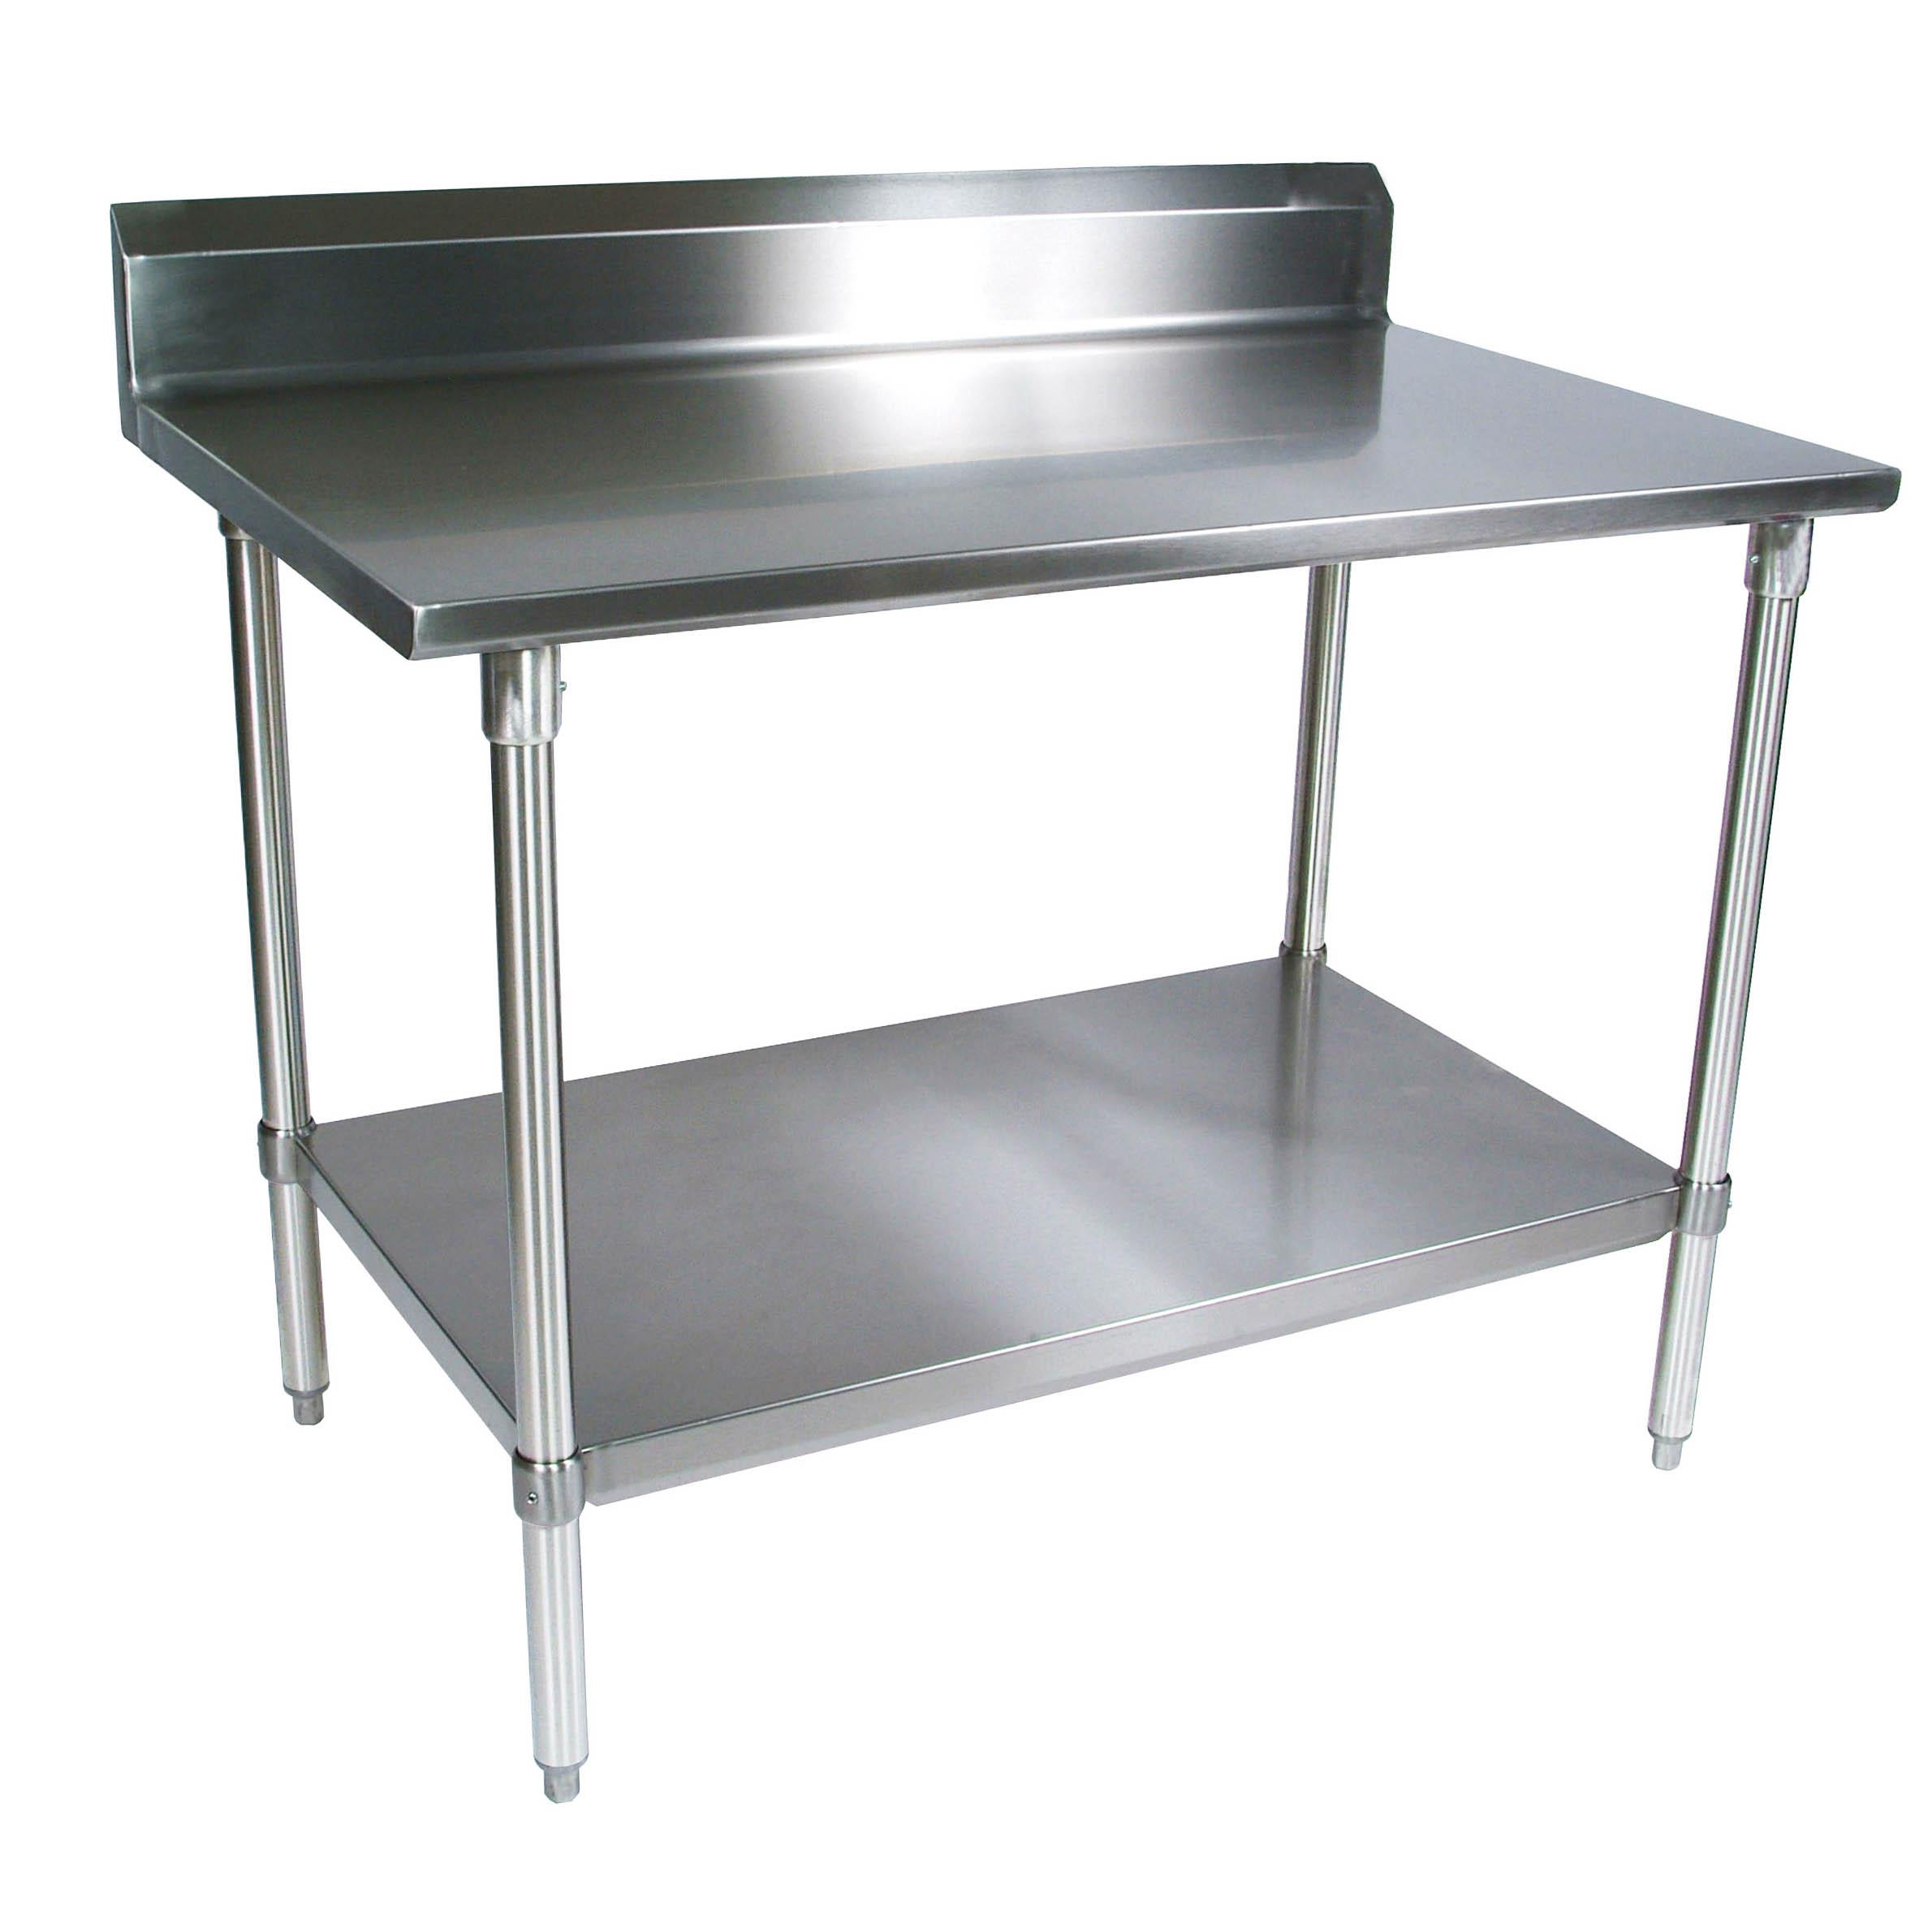 BK Resources CTTR5-4830 work table,  40